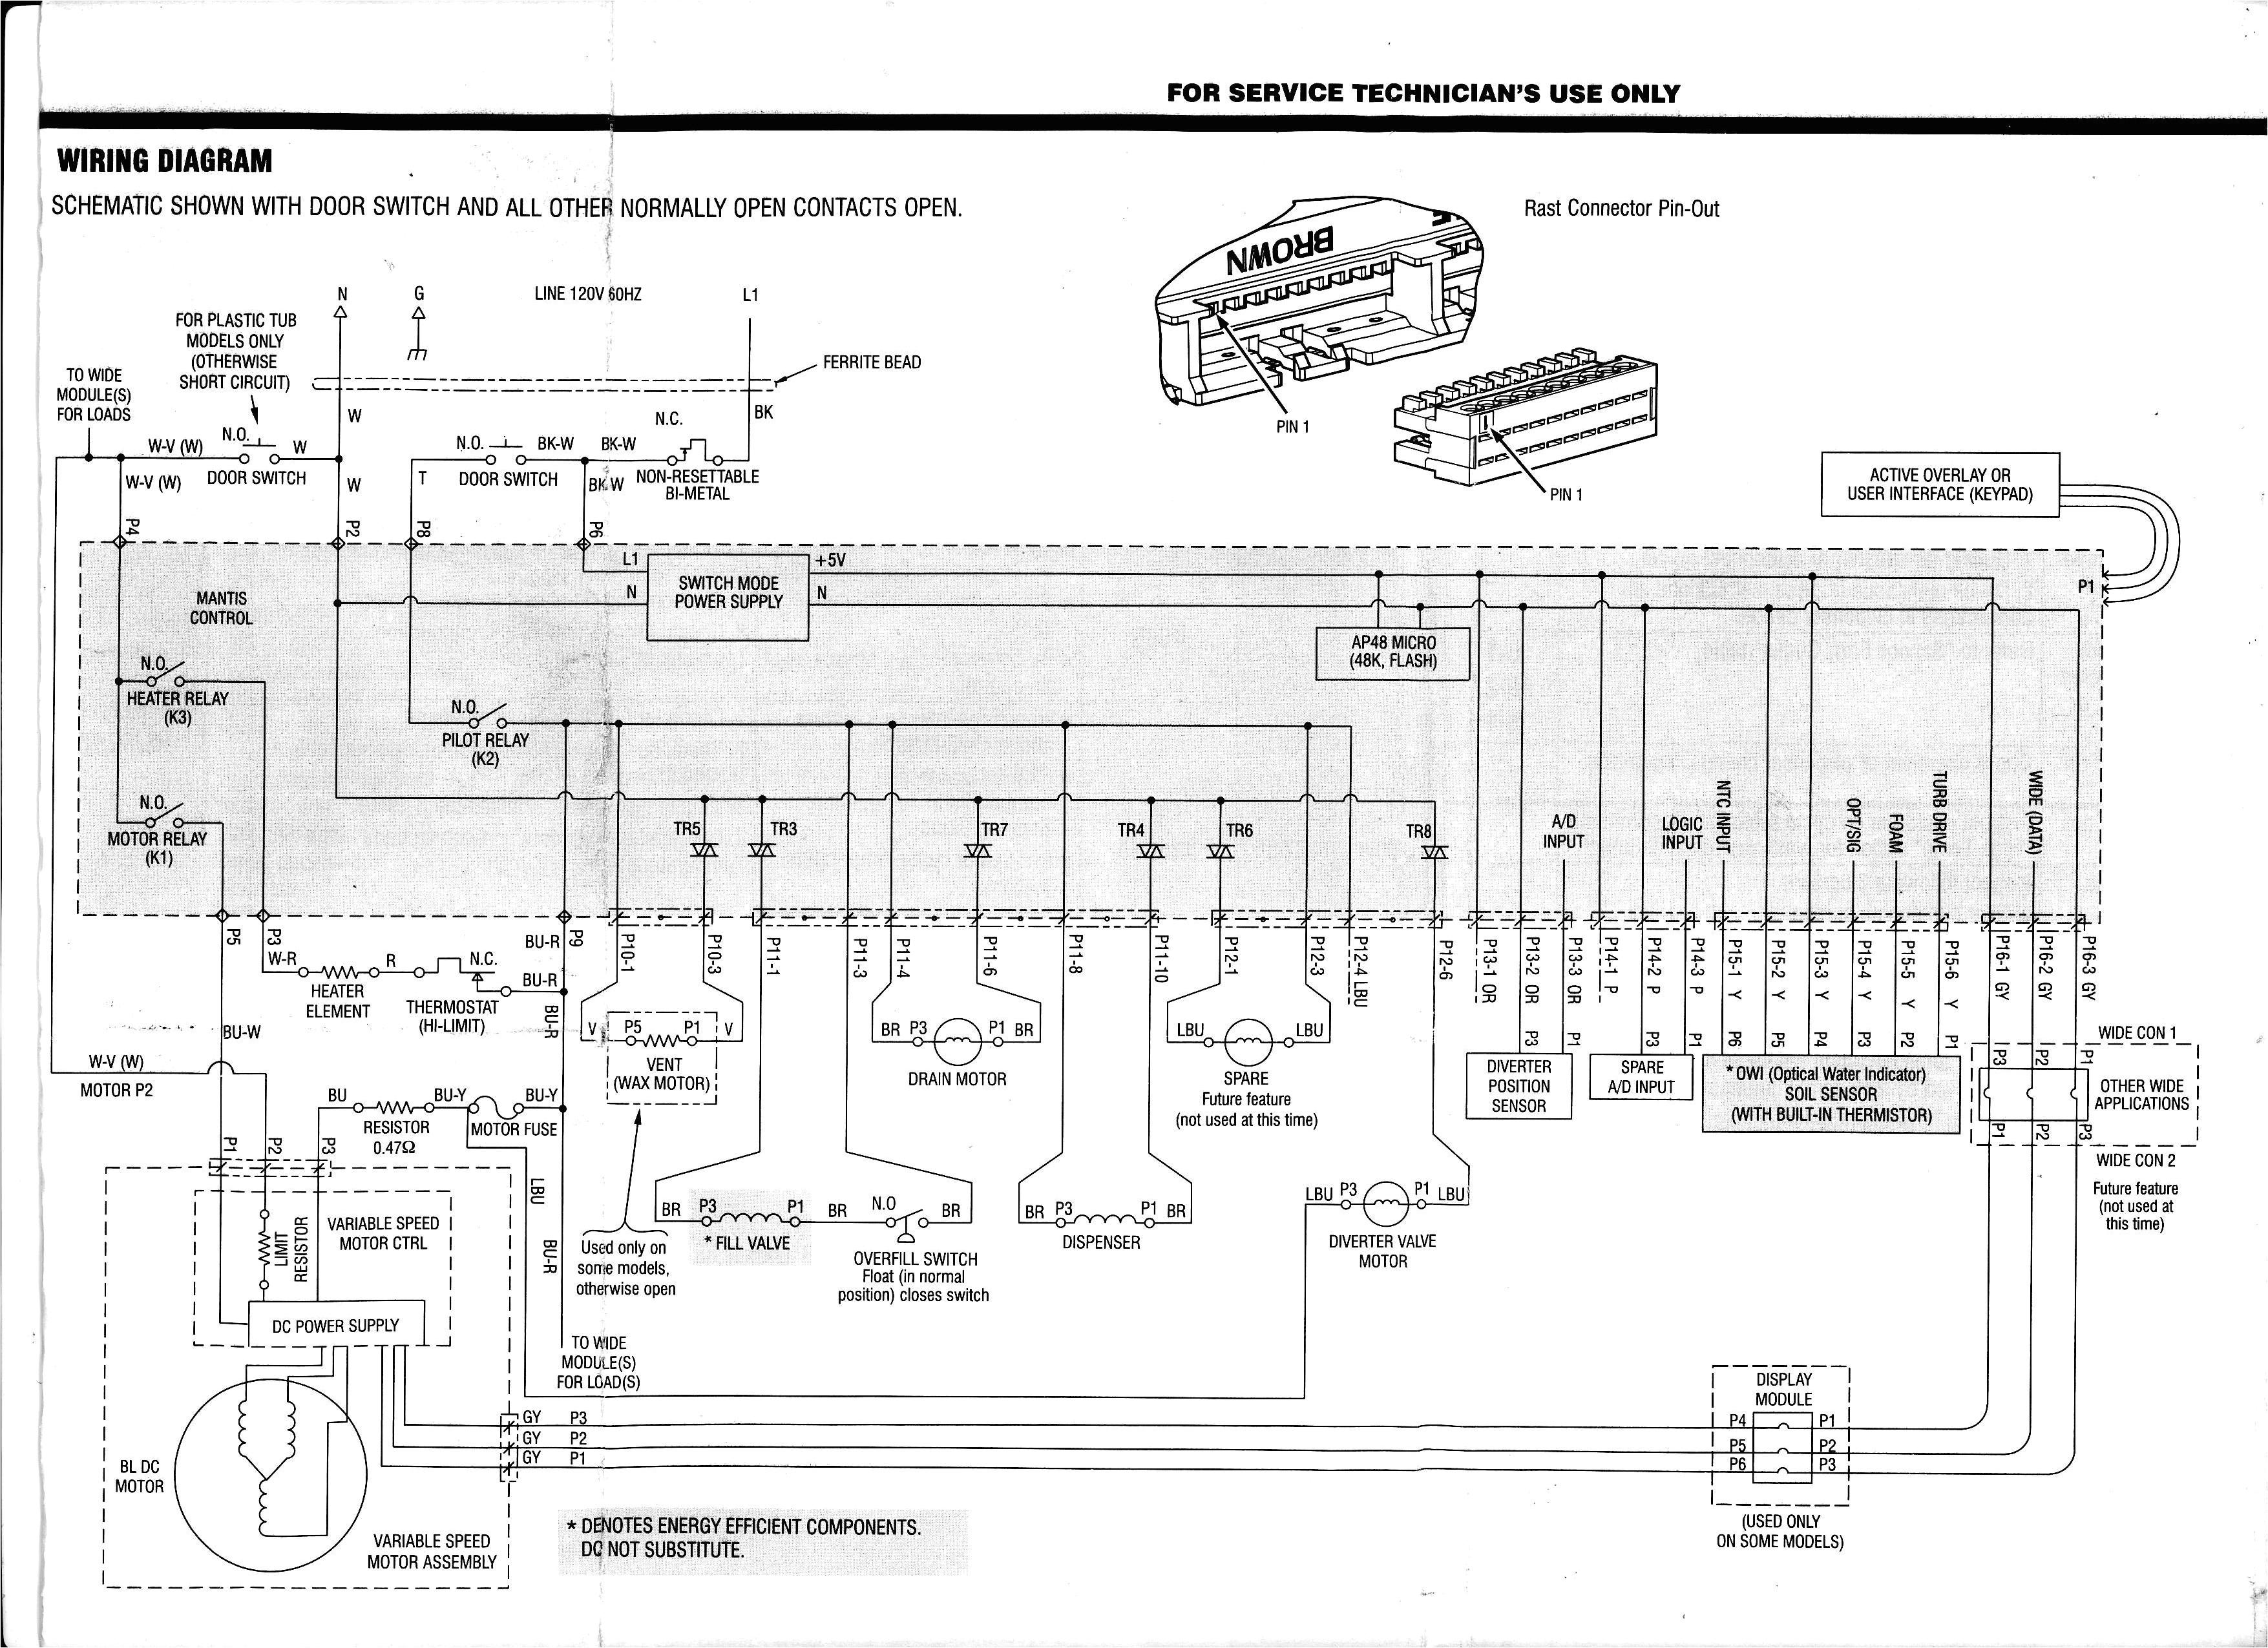 wrg 3749 norcold refrigerator wiring diagramadmiral refrigerator wiring schematic detailed schematics diagram rh yogajourneymd com